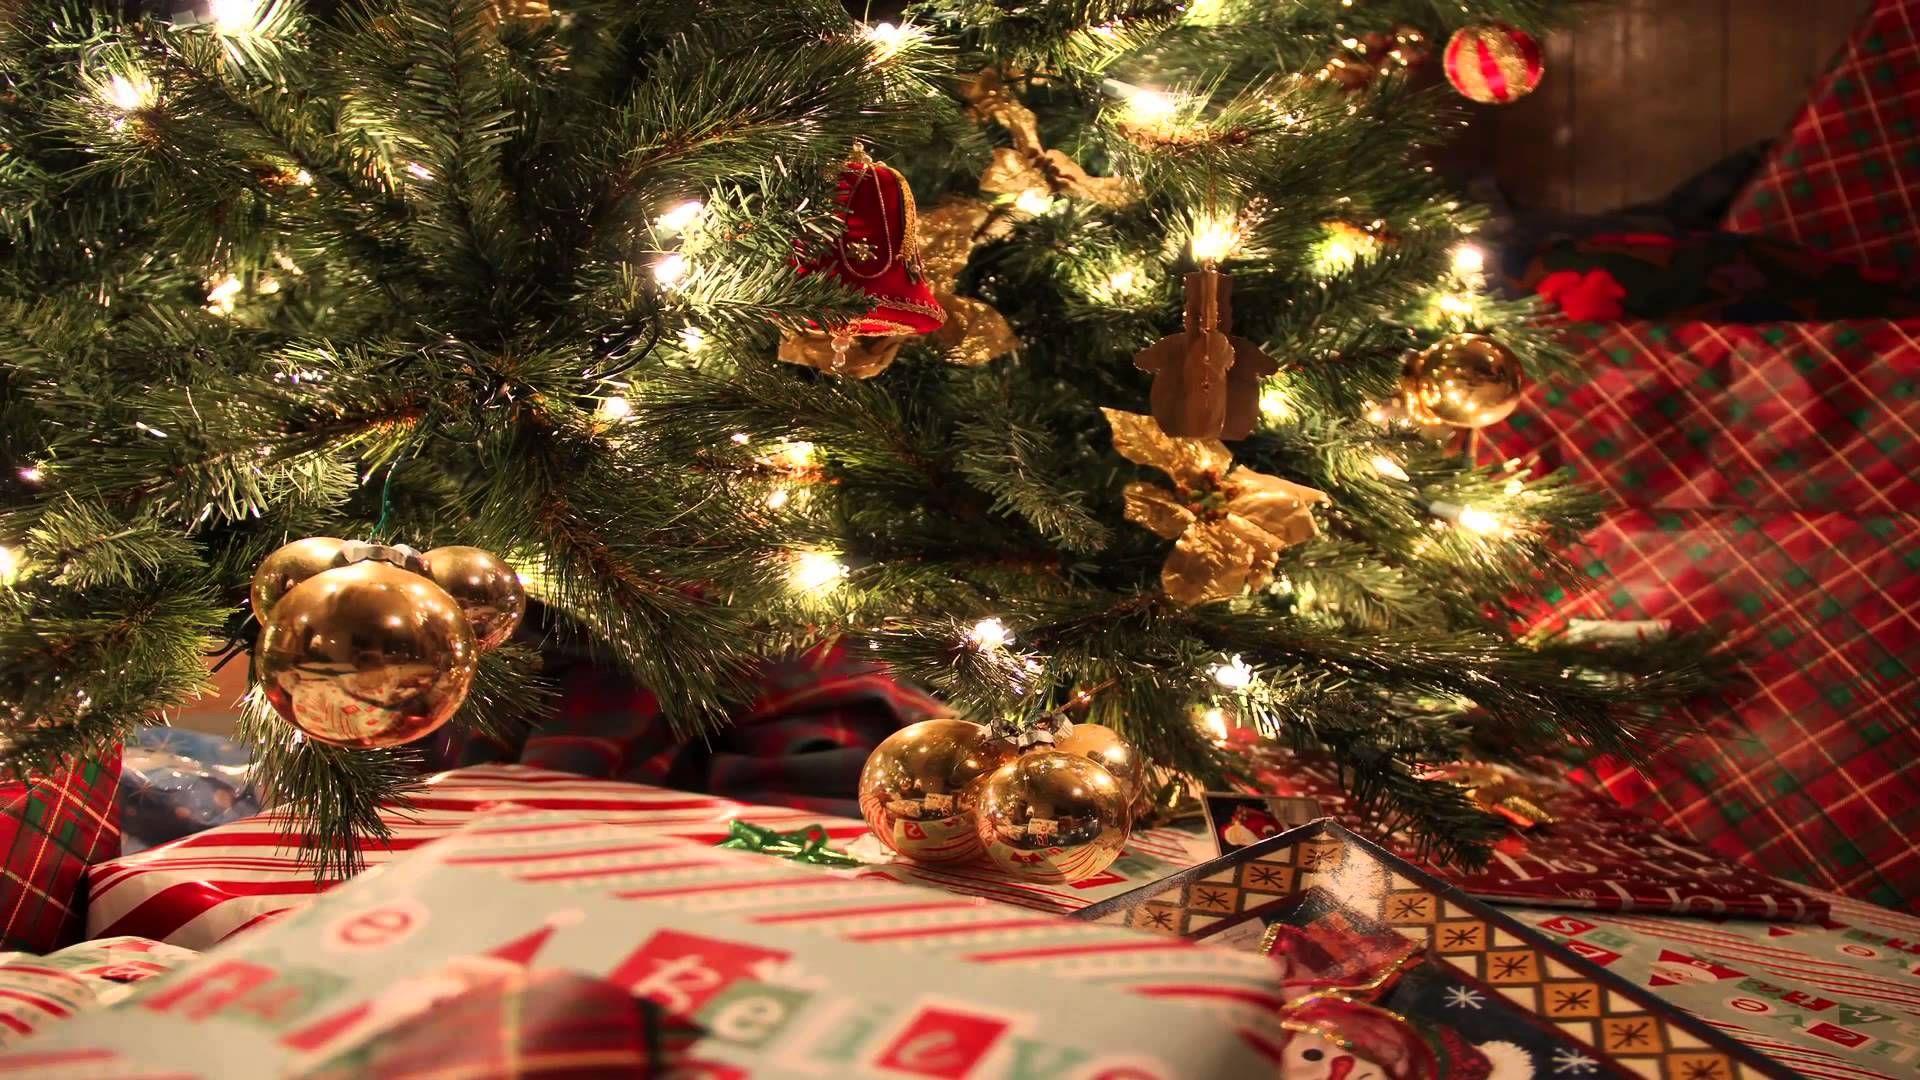 Silent Night Instrumental Christmas Music Christmas